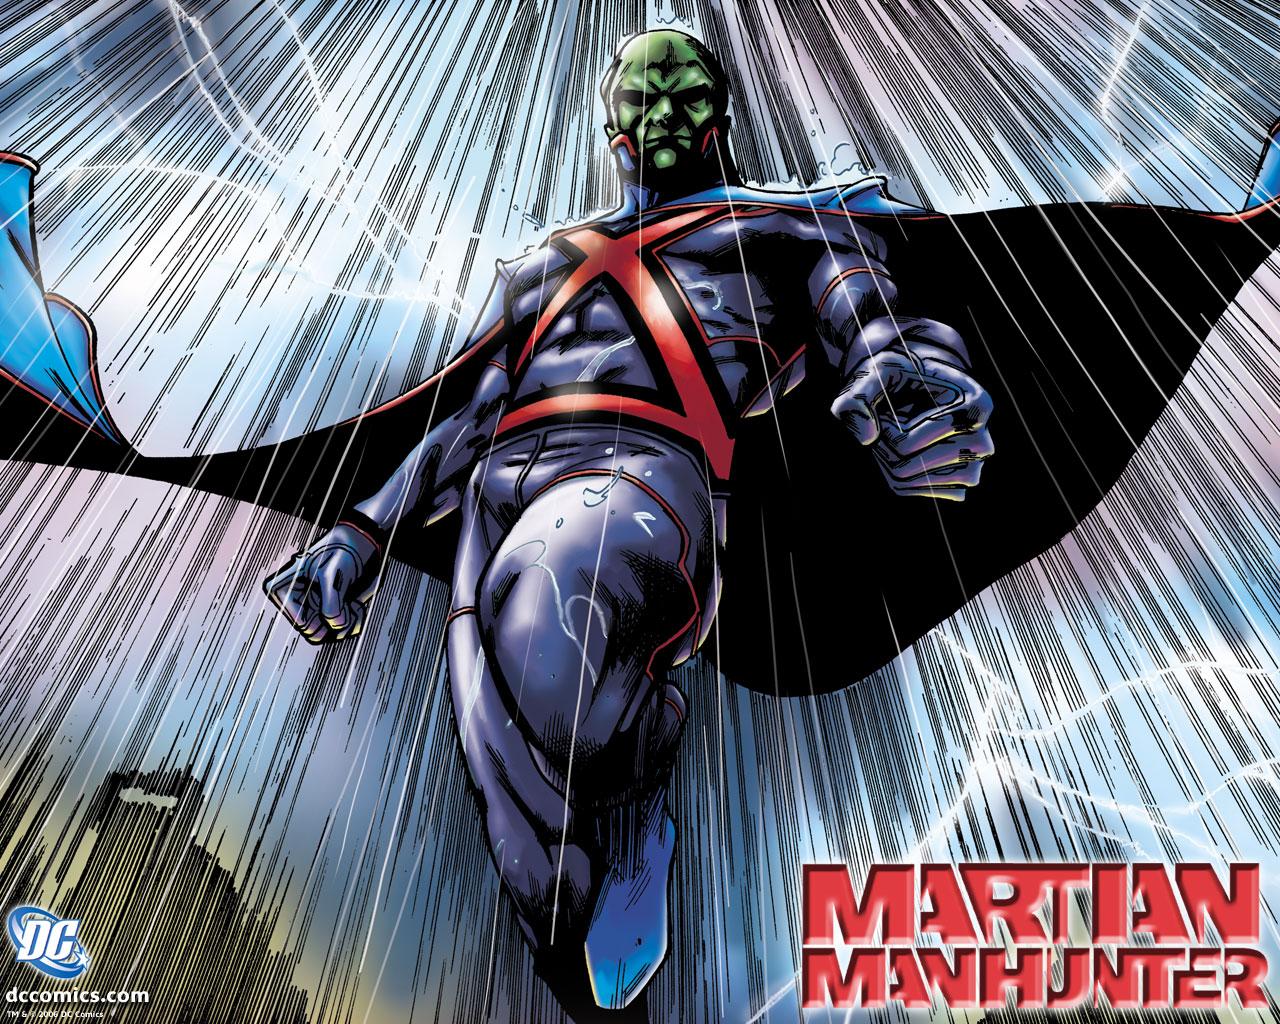 Injustice : Gods Among Us – Martian Manhunter rejoint le crew